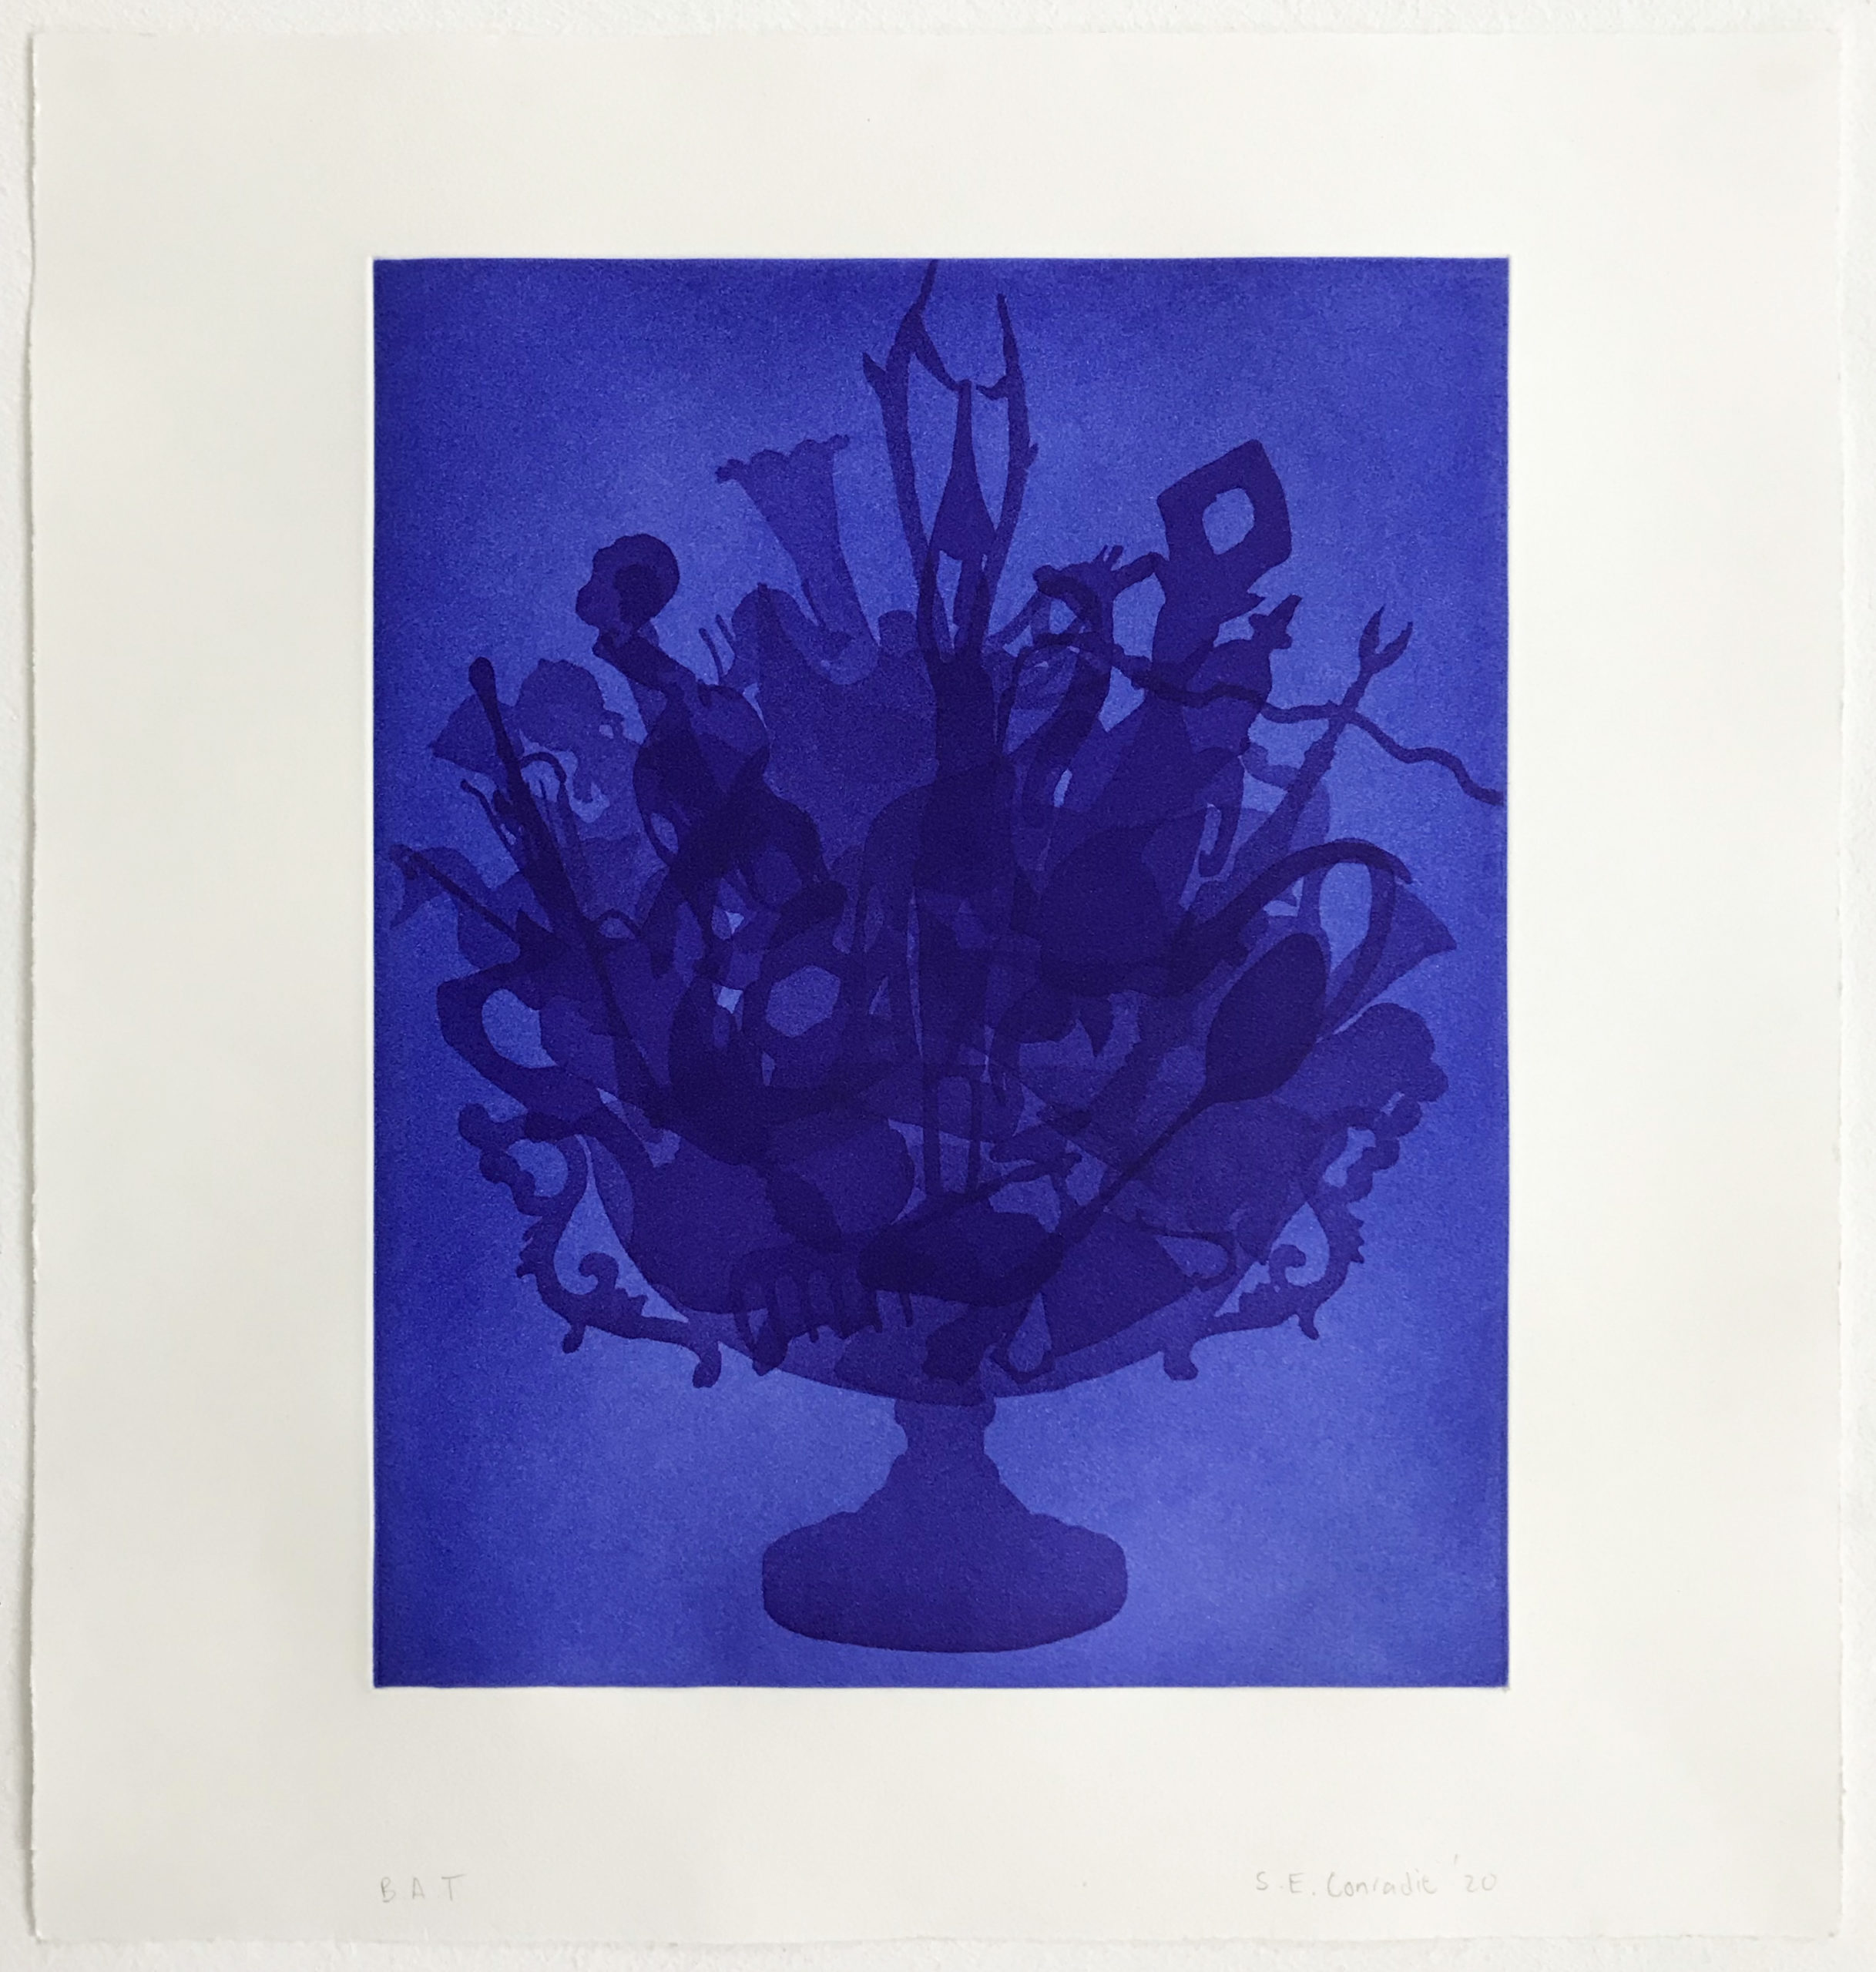 Stephané Conradie, Print, Etching, Edition S